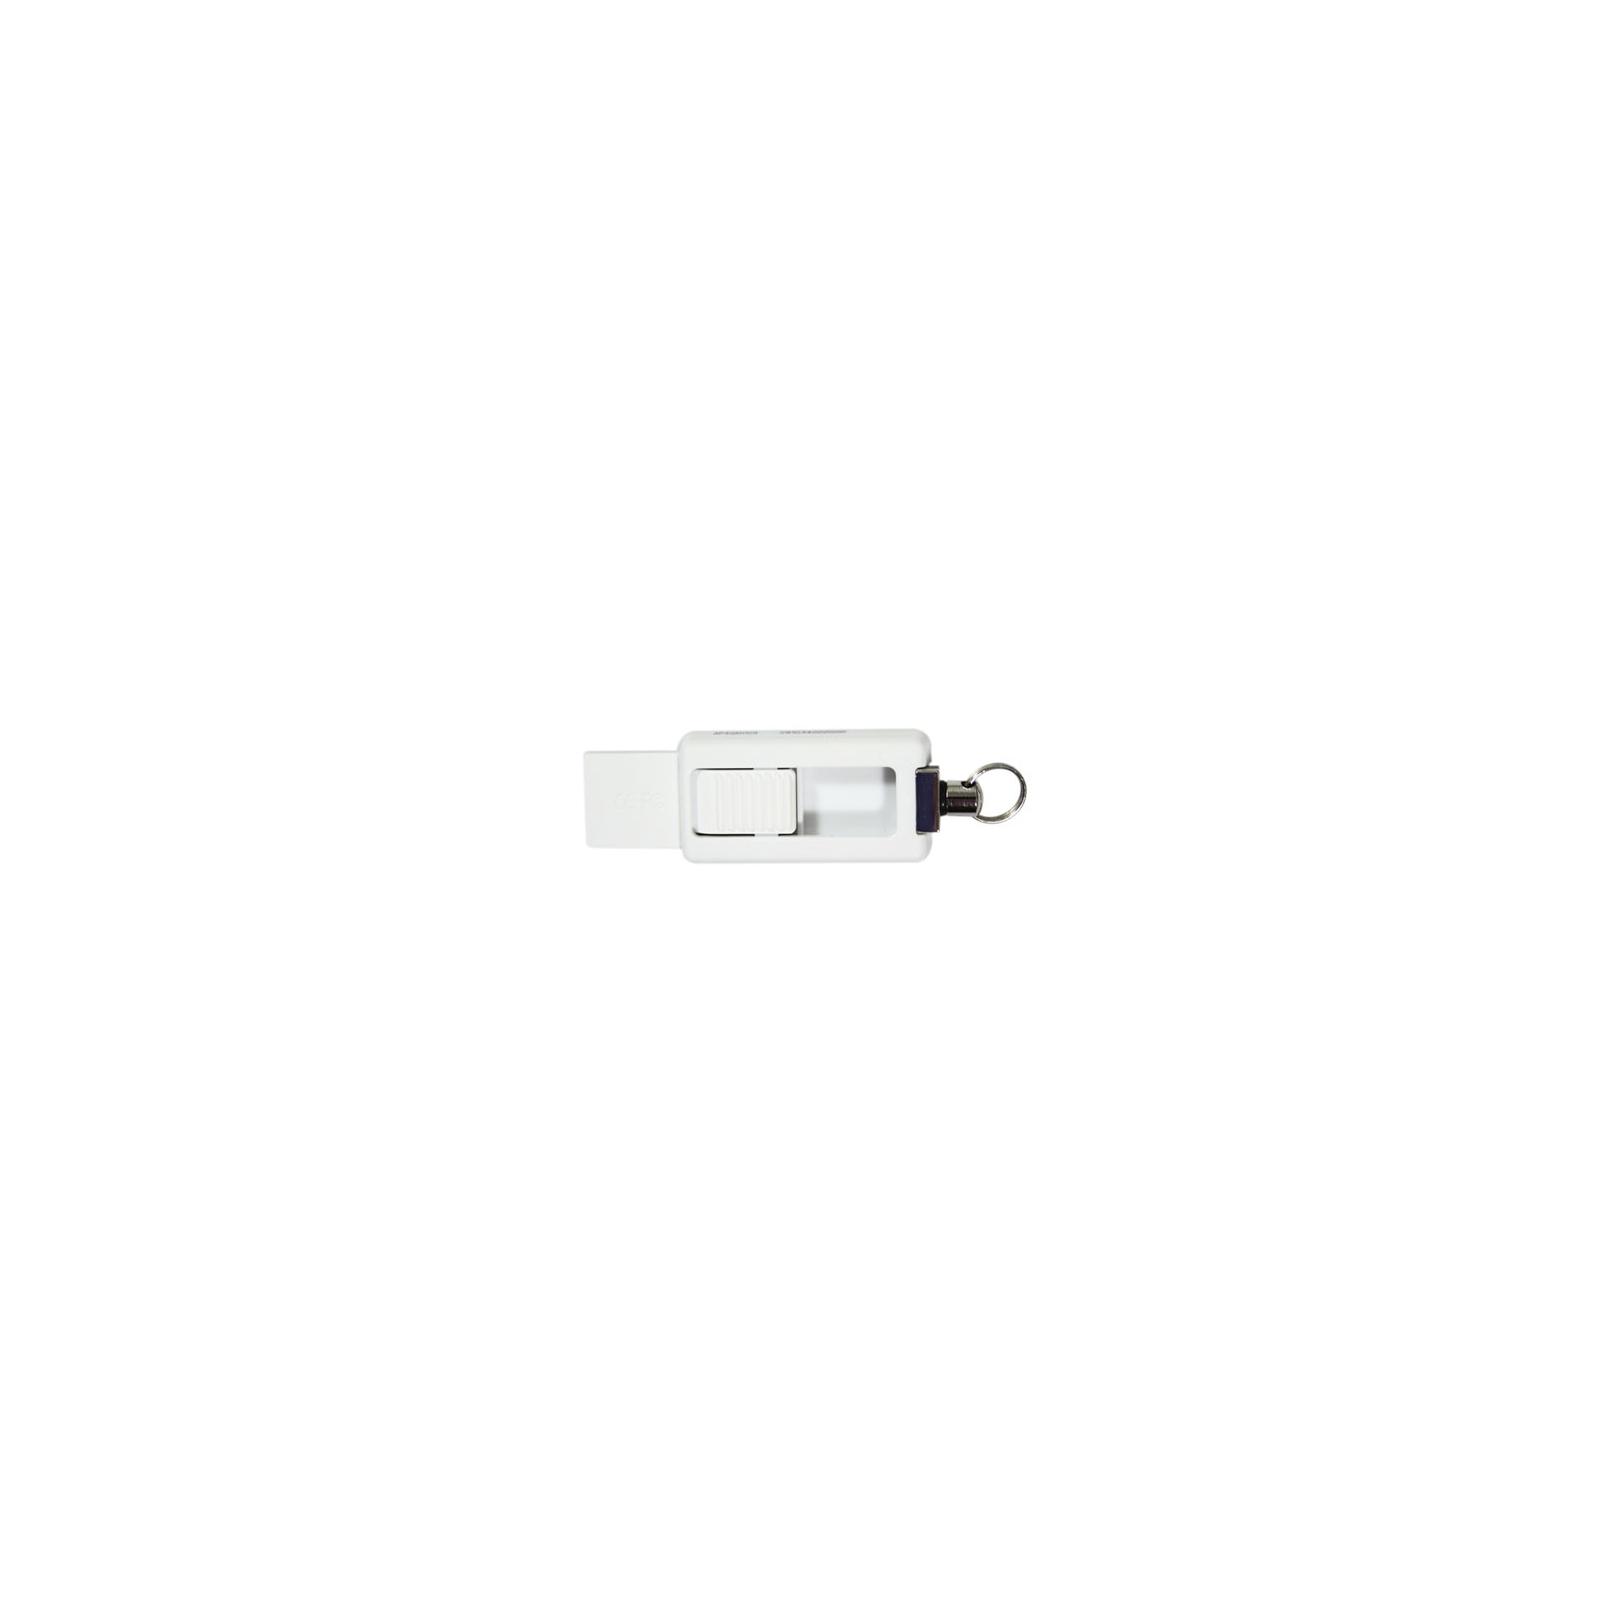 USB флеш накопитель 32GB AH129 Pink RP USB2.0 Apacer (AP32GAH129P-1) изображение 3